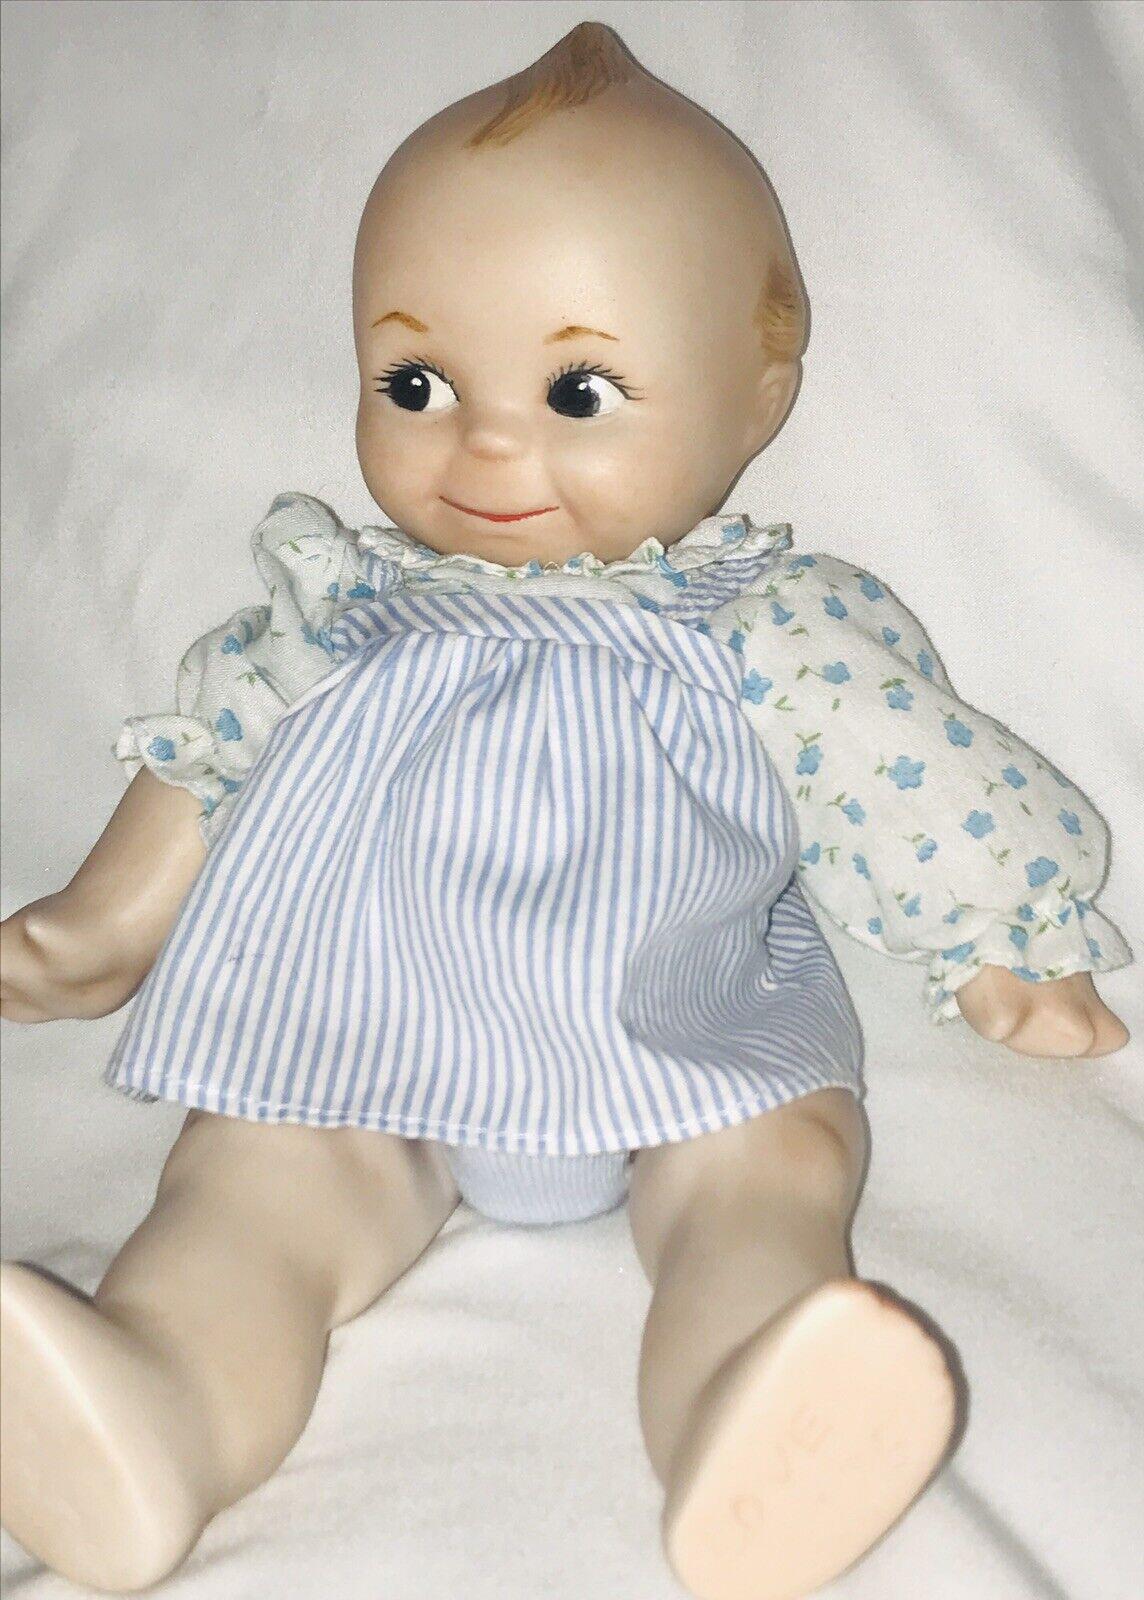 Qewpie Danbury Mint Porcelain Doll Jointed Vintage 1984 bluee Floral Dress Nice